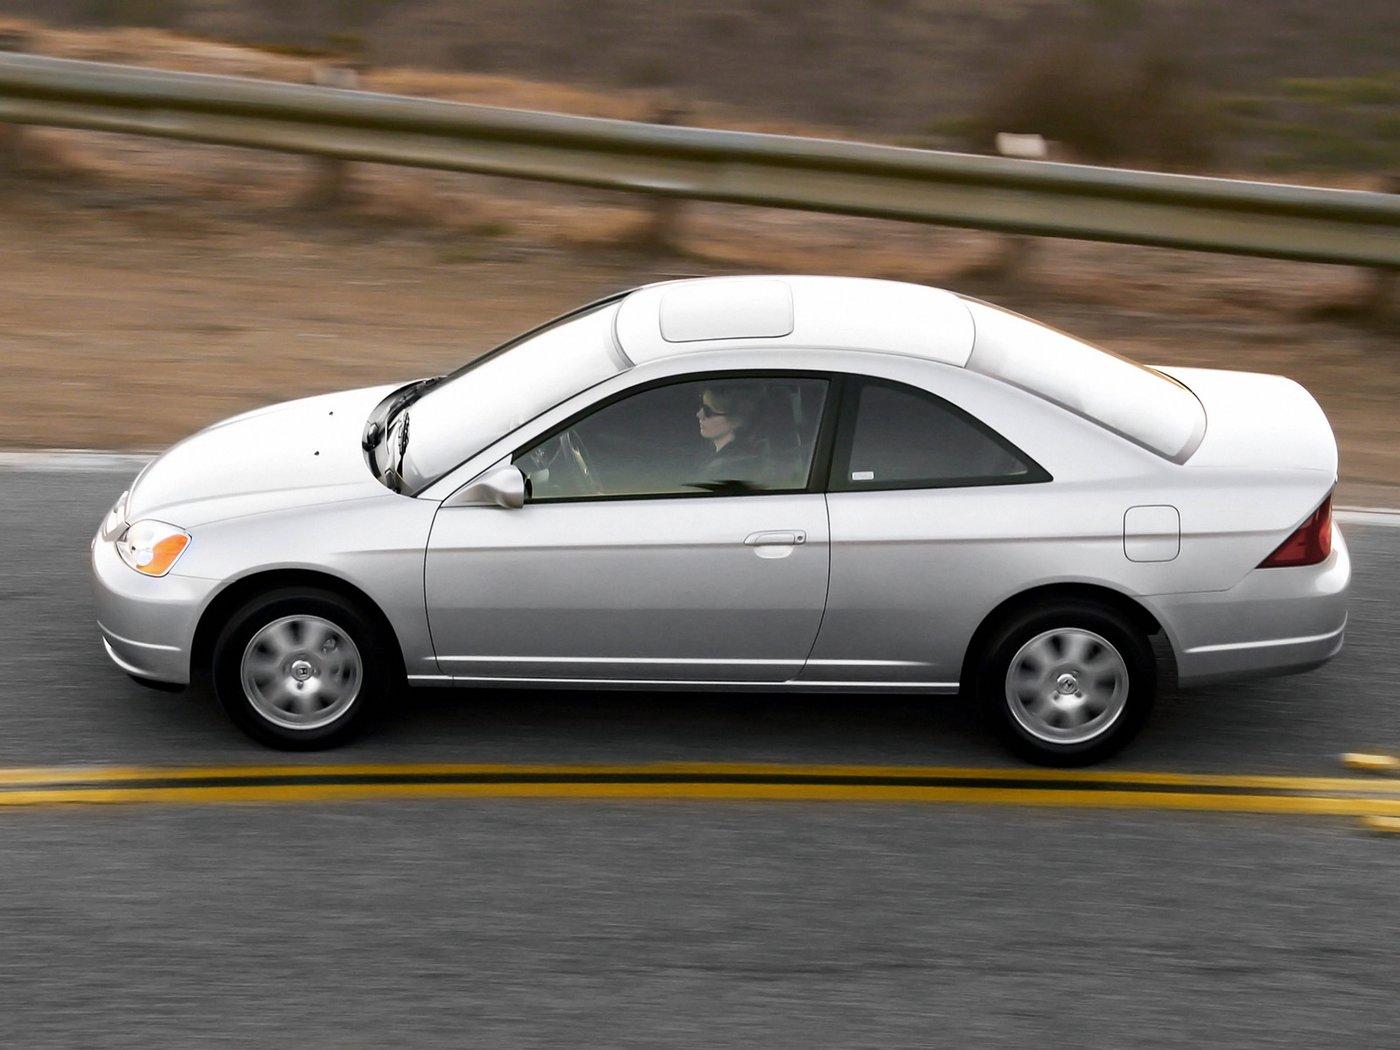 [Imagen: Honda-civic-coupe-us-spec-4.jpg]